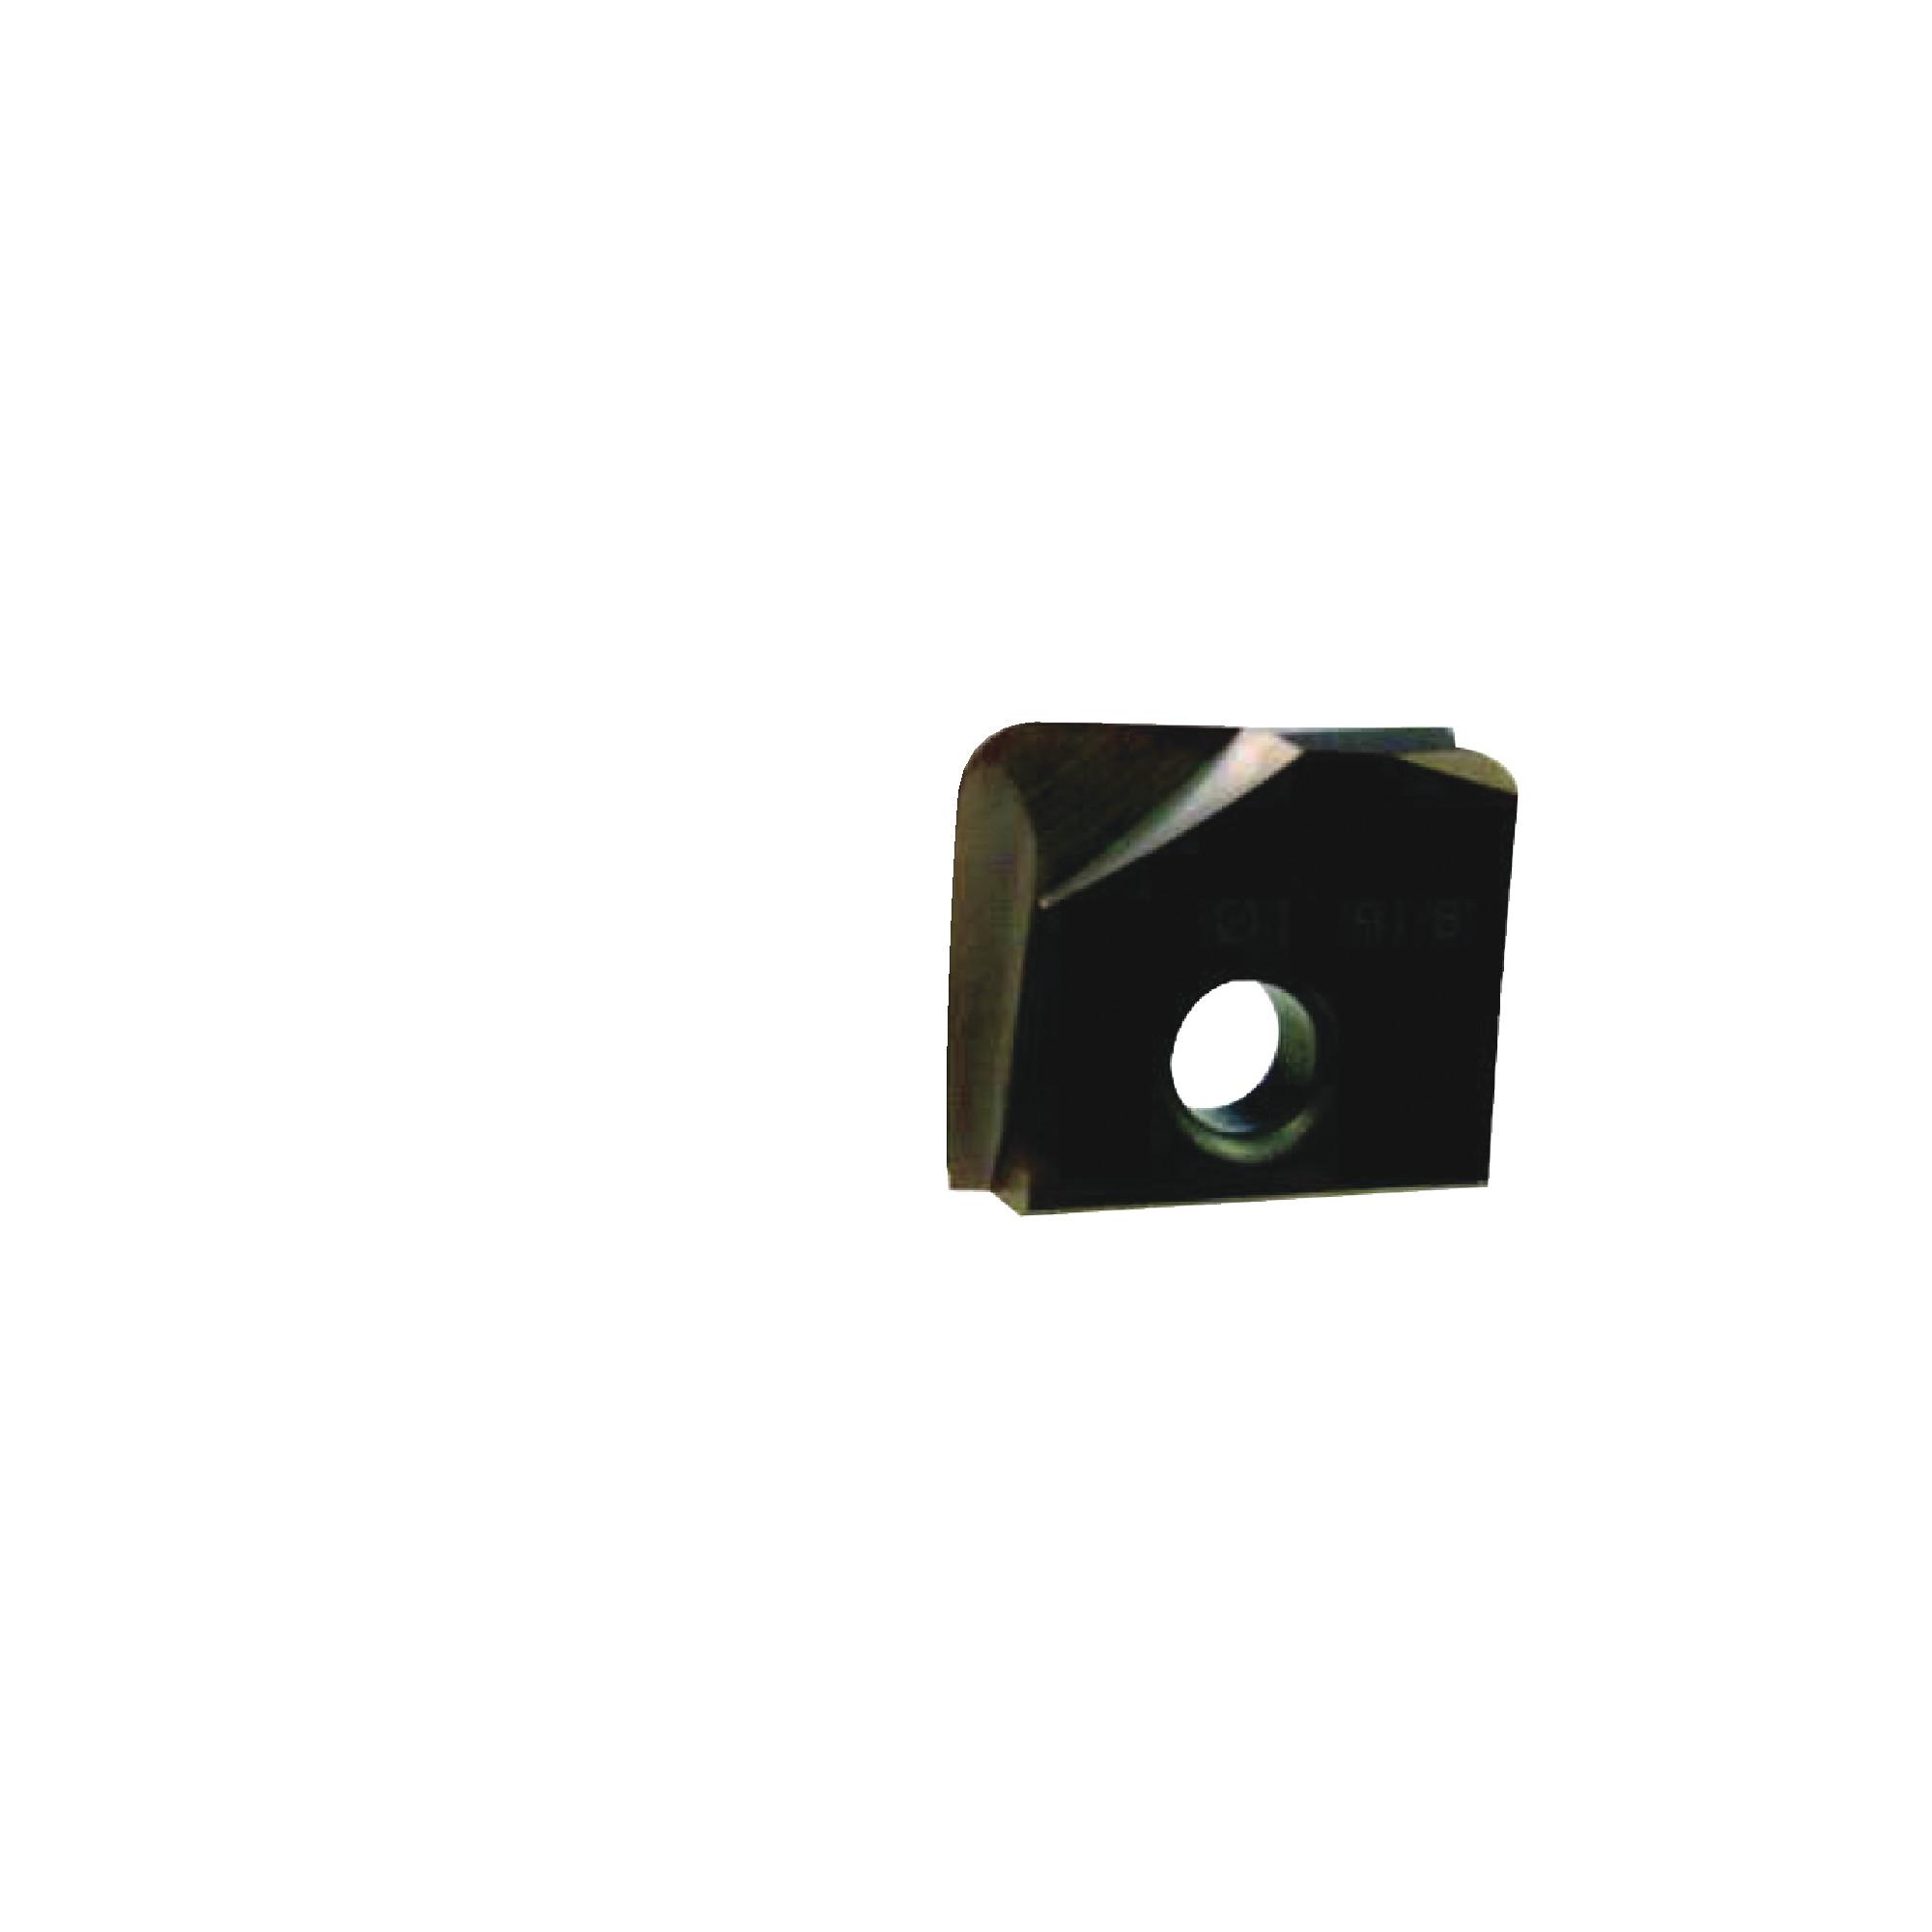 "YG - XR2A02001 / Indexable Corner Radius Carbide Insert for i-Xmill Series / 1/64"" Radius"